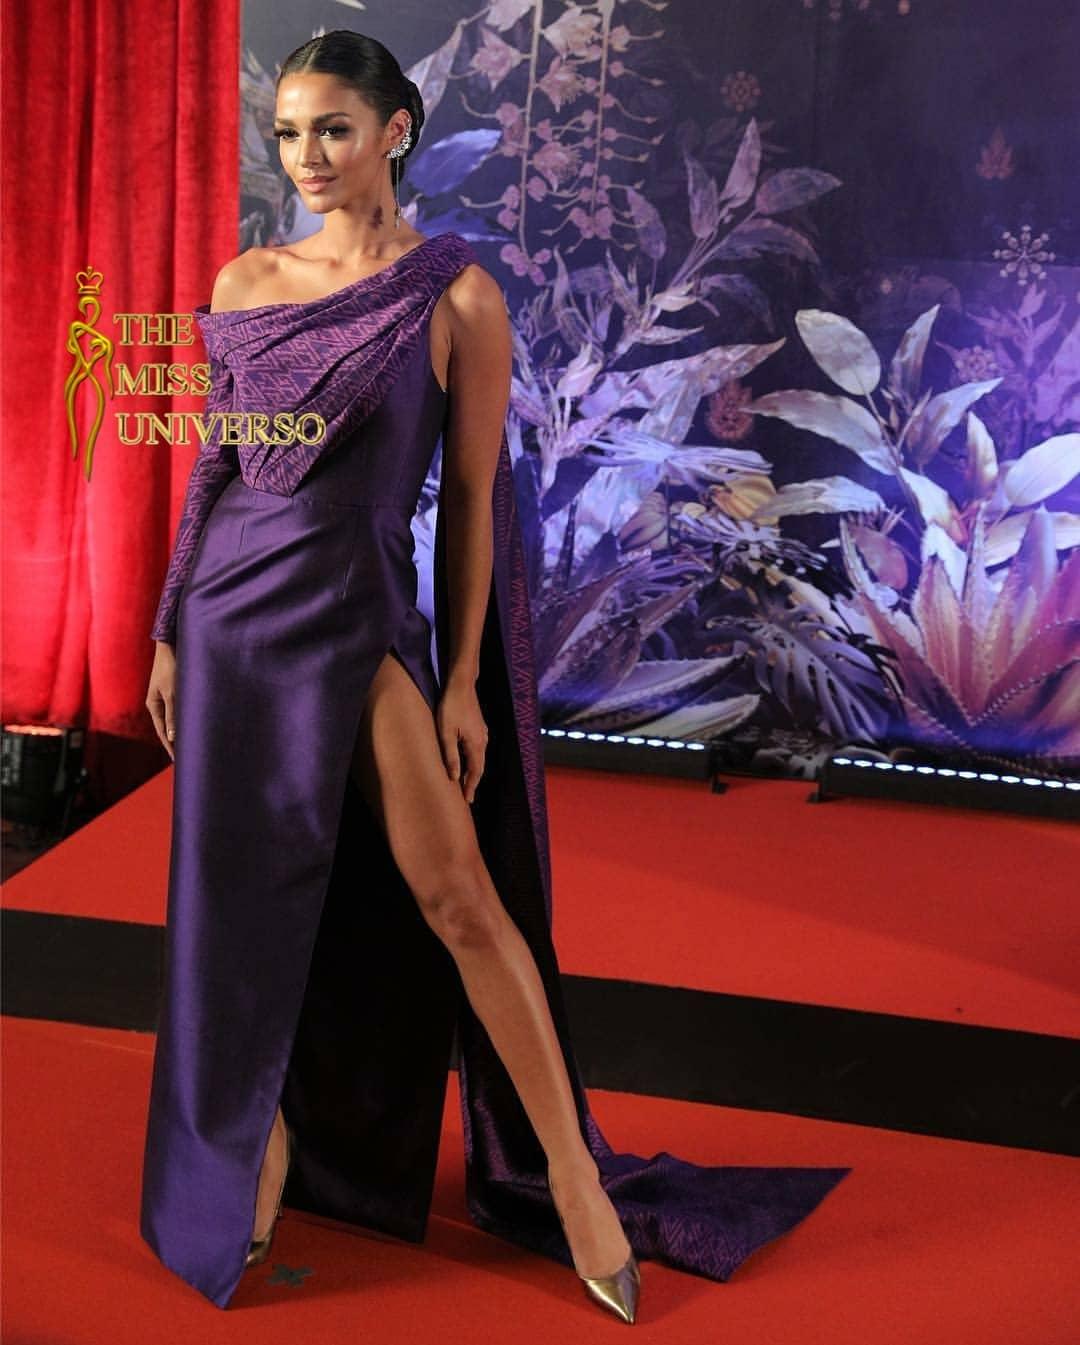 thai night gala dinner de candidatas a miss universe 2018. - Página 9 Z3ibix10